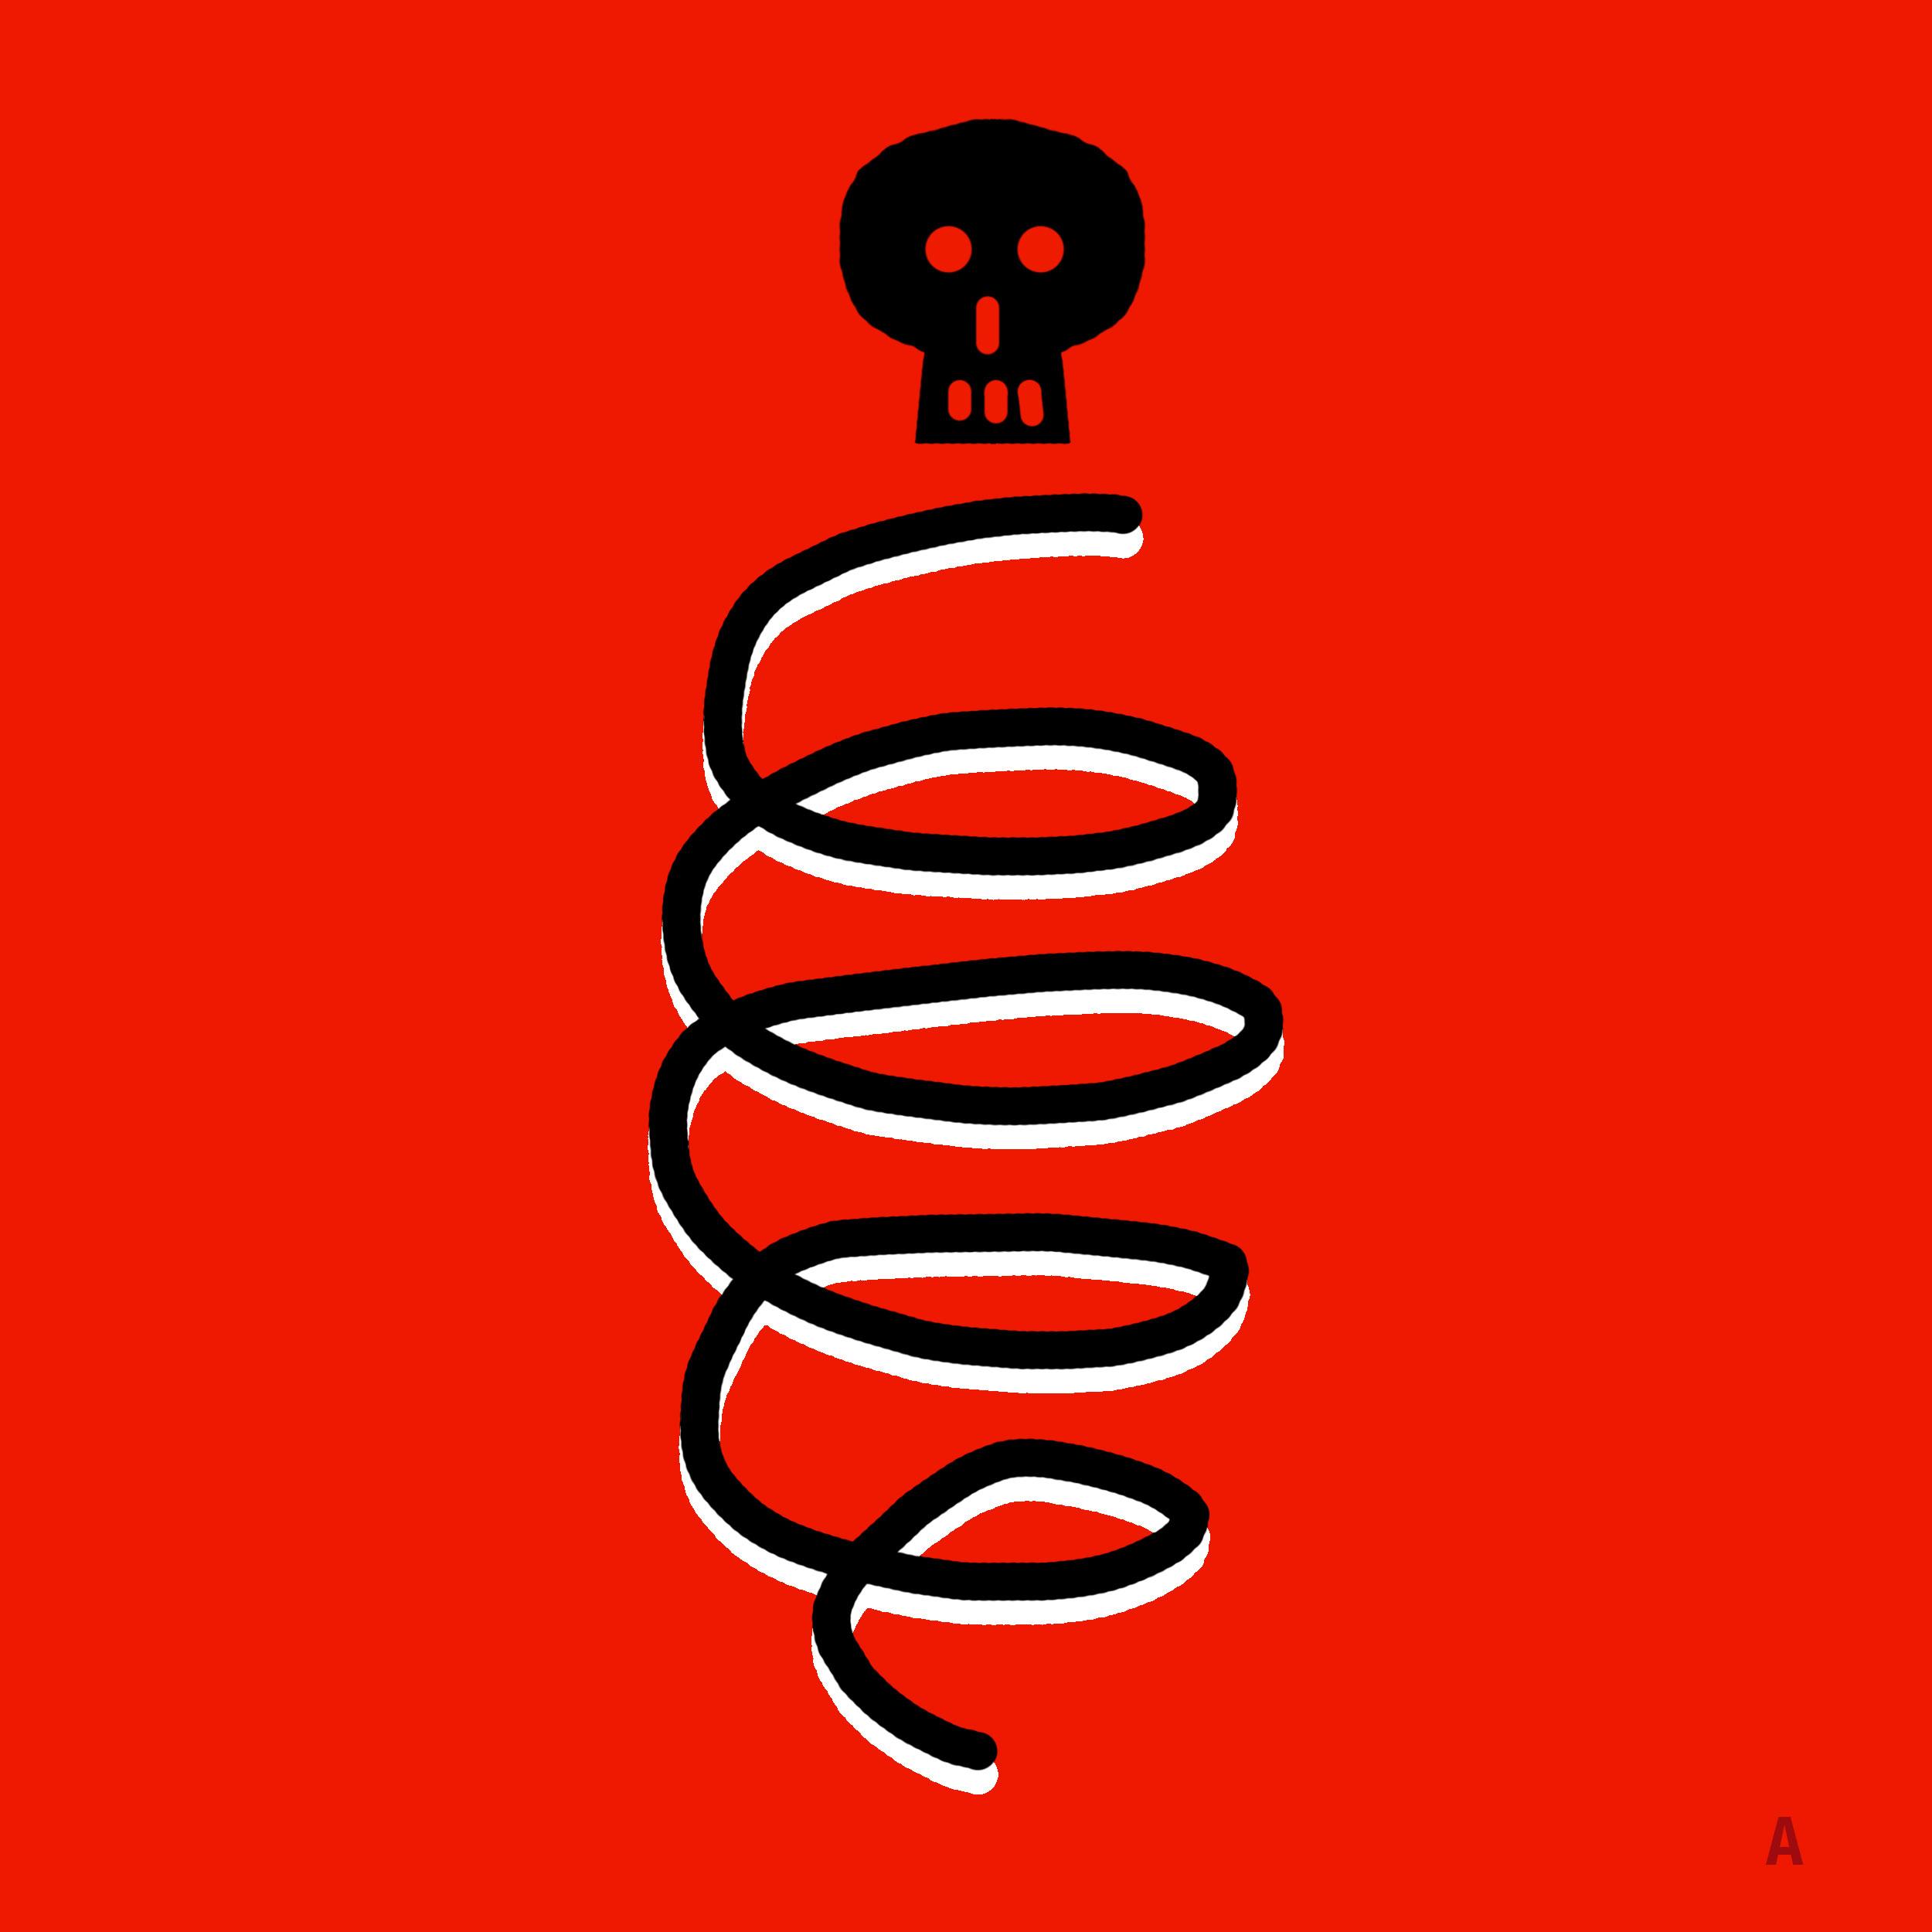 gs_blog_death_spiral_01_sfw_2500_meta.jpg